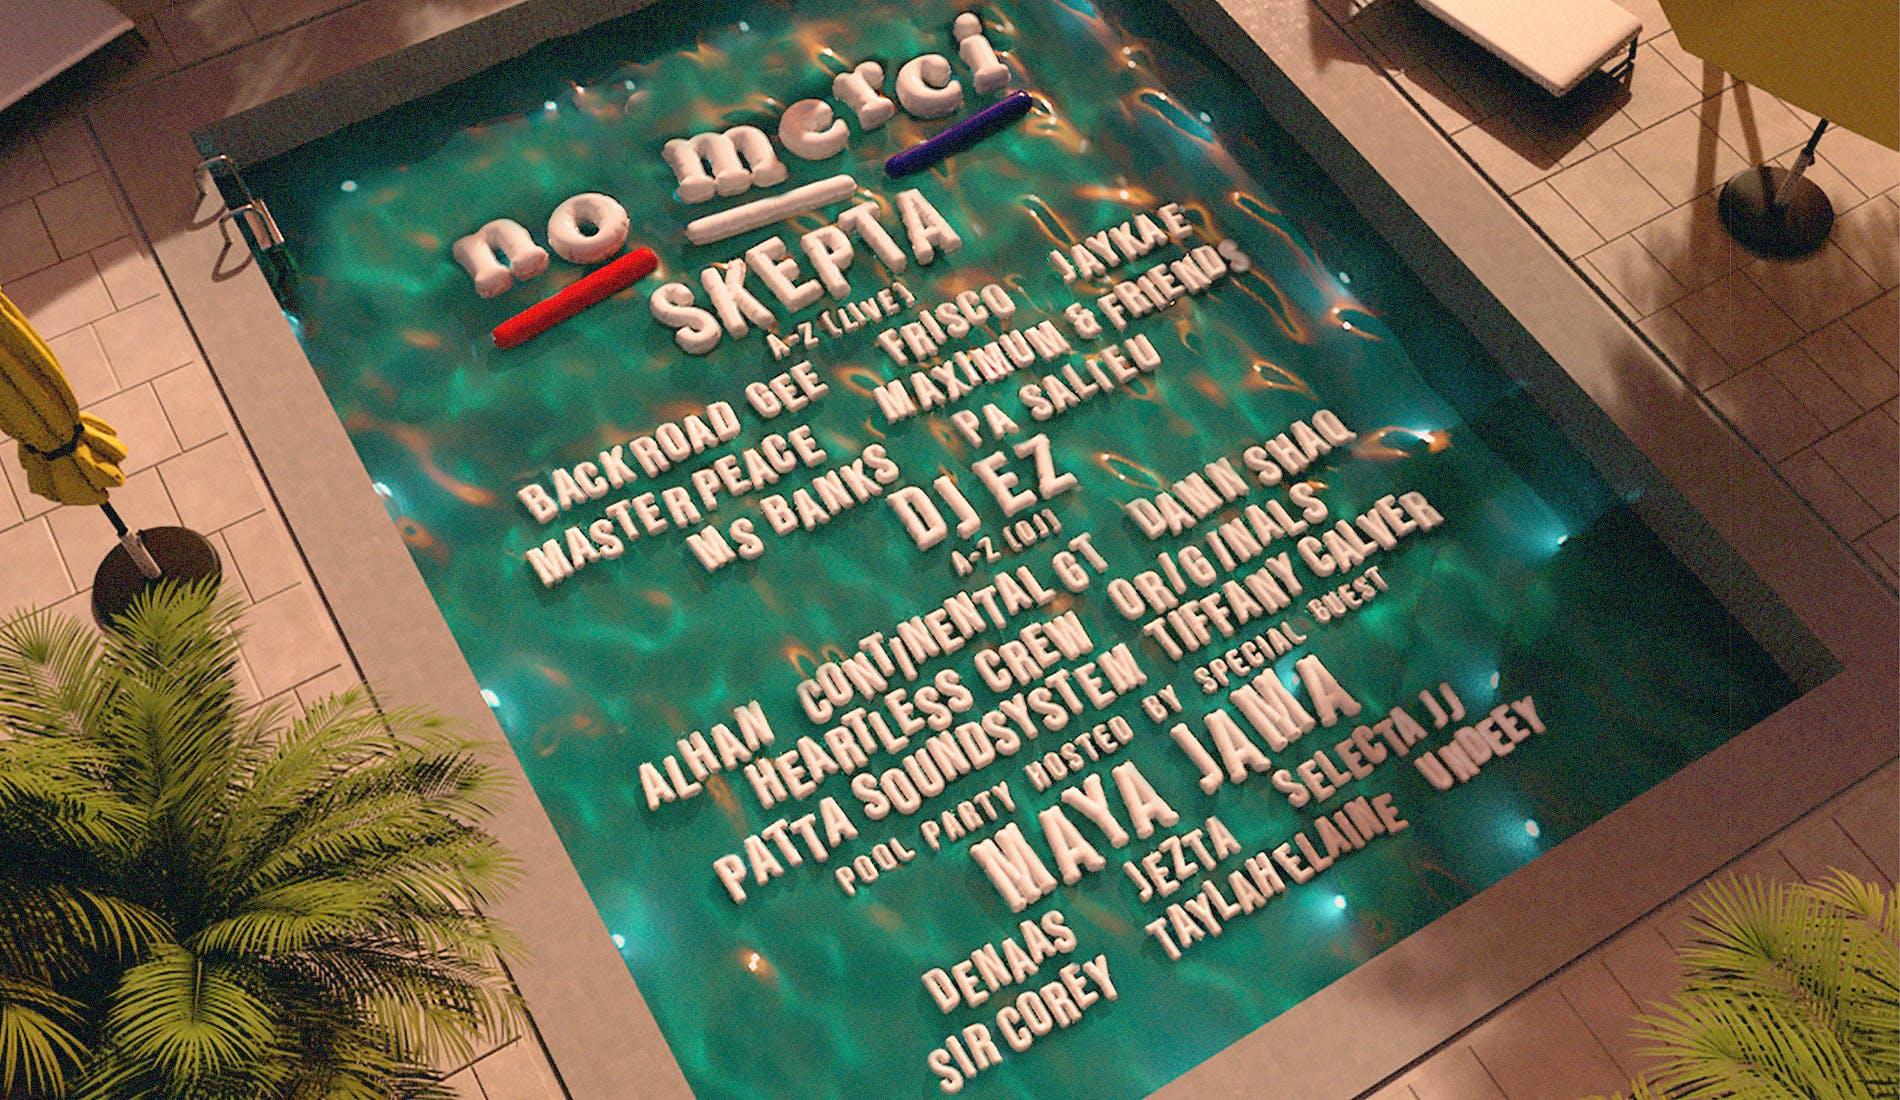 No Merci Skepta lineup poster